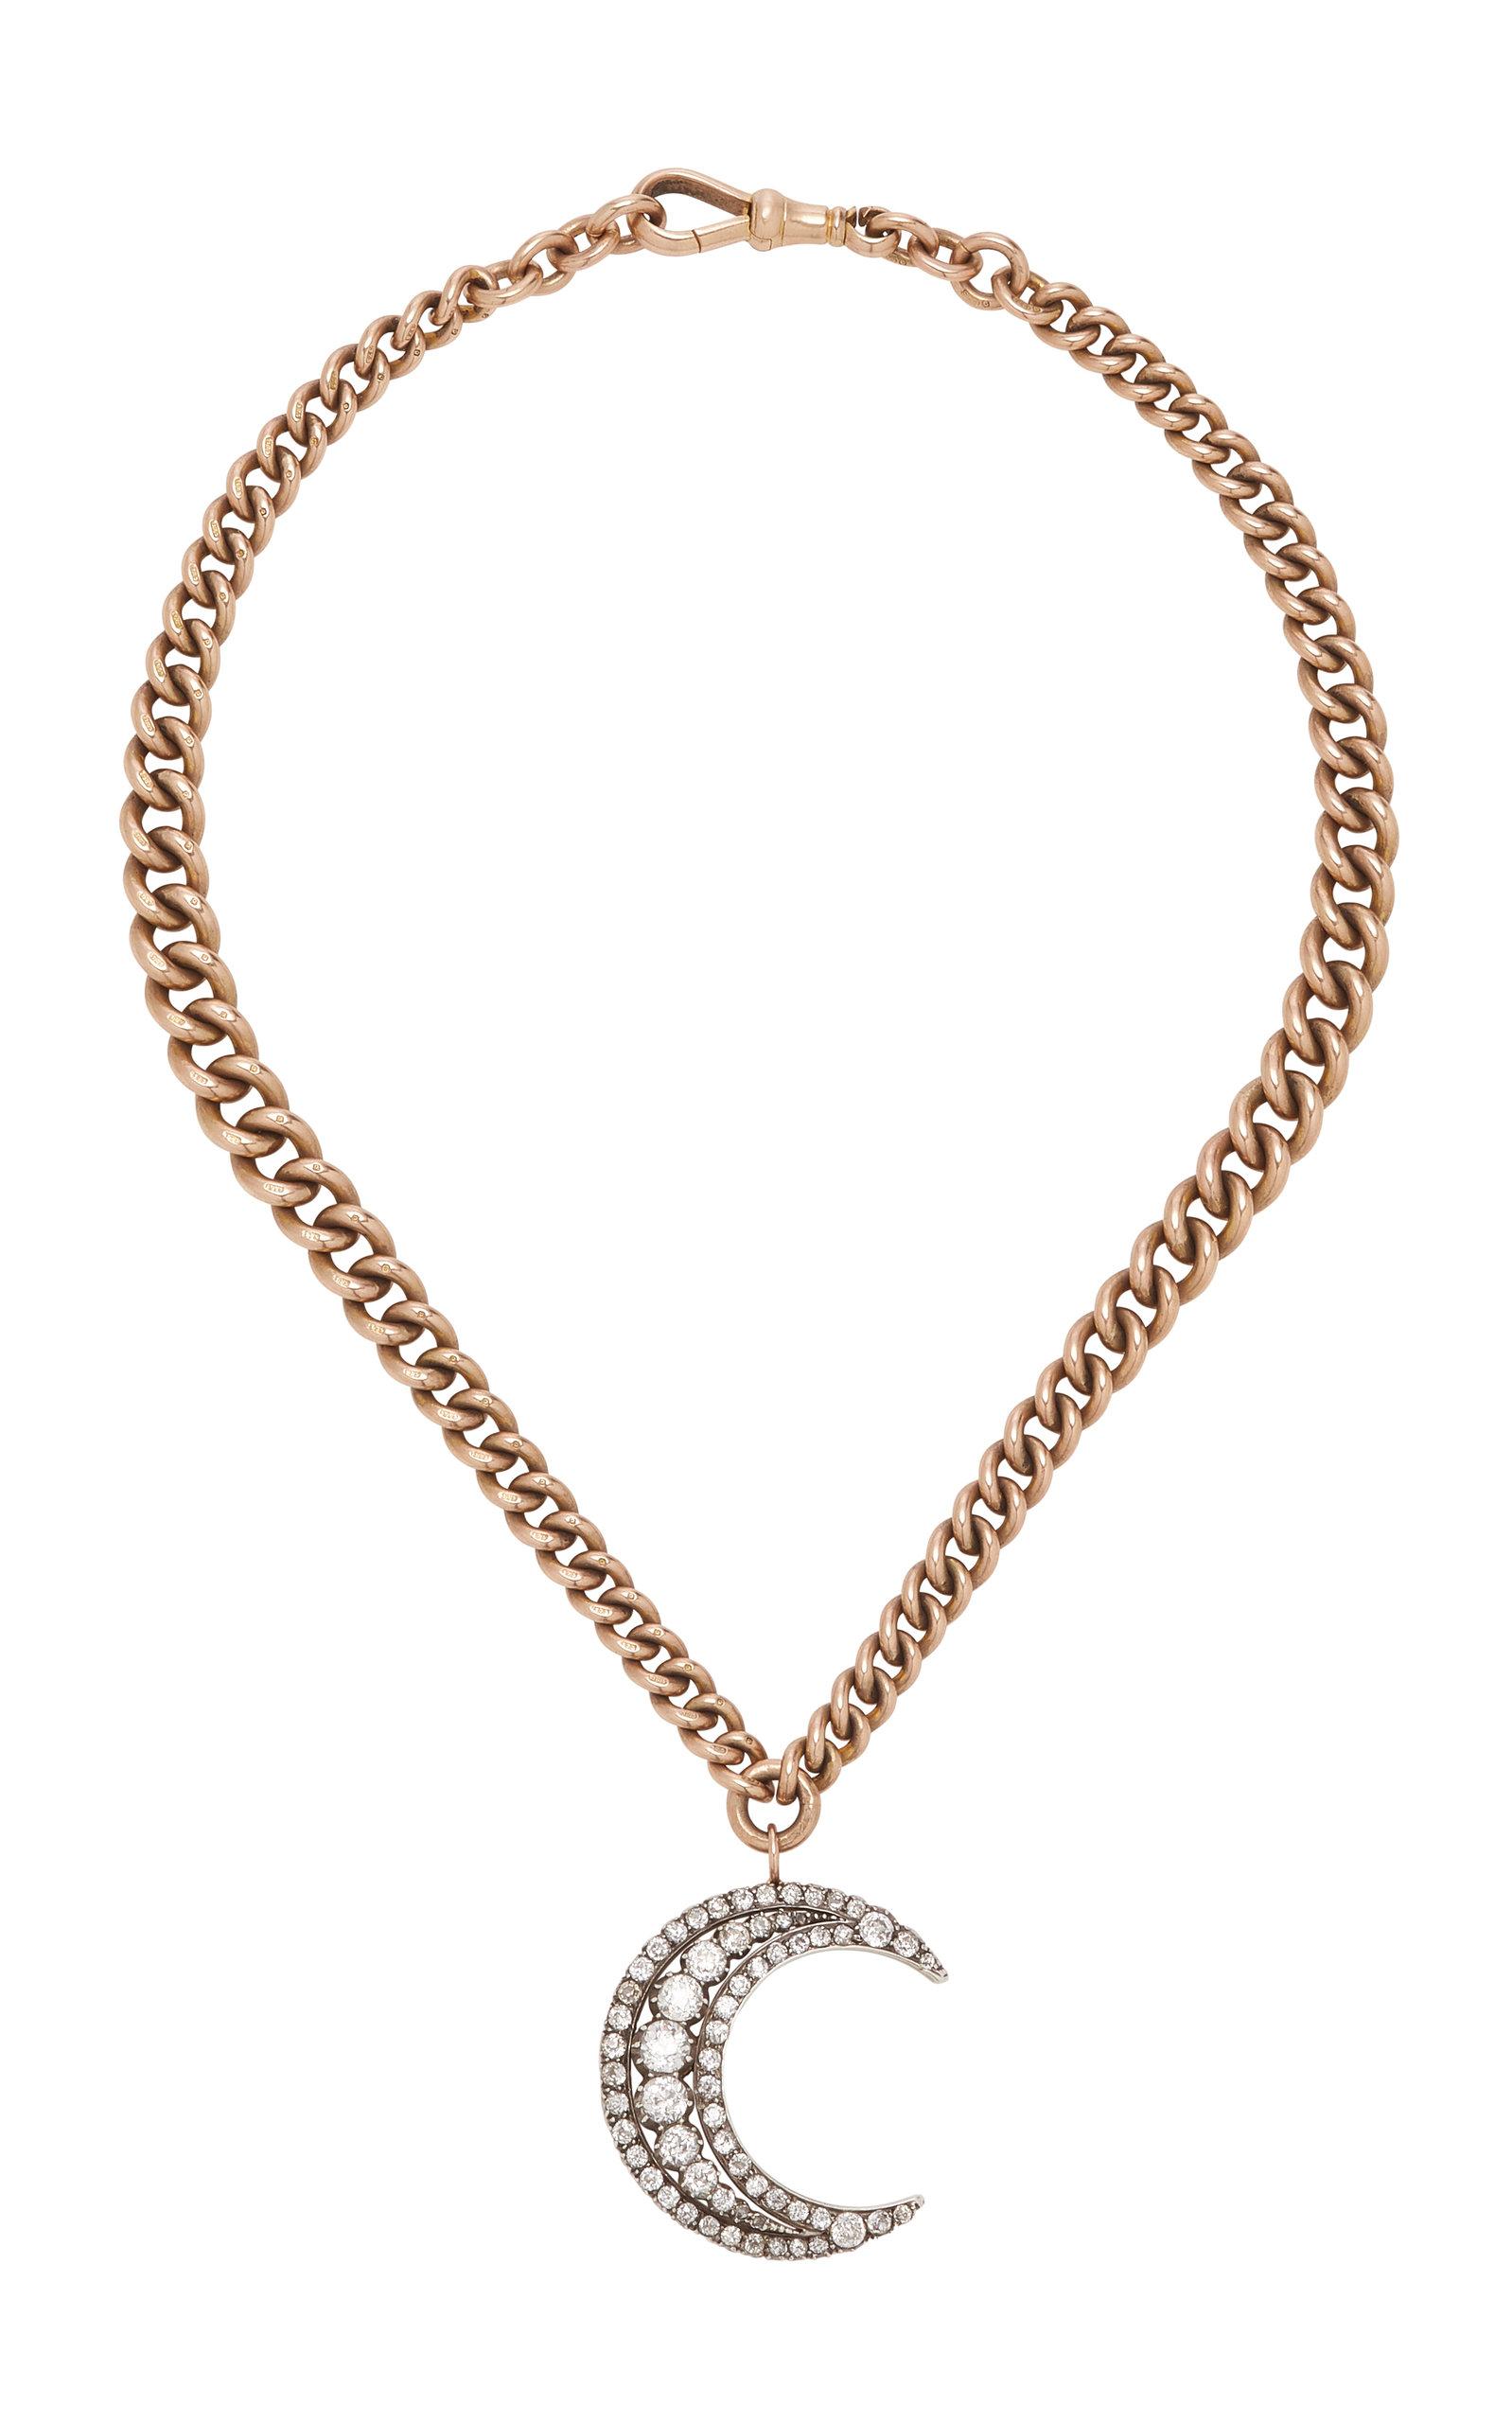 f7f3eafa4db7 Large toni chloe goutal white peyton rose gold diamond necklace jpg  1598x2560 Victoria crescent chloe goutal